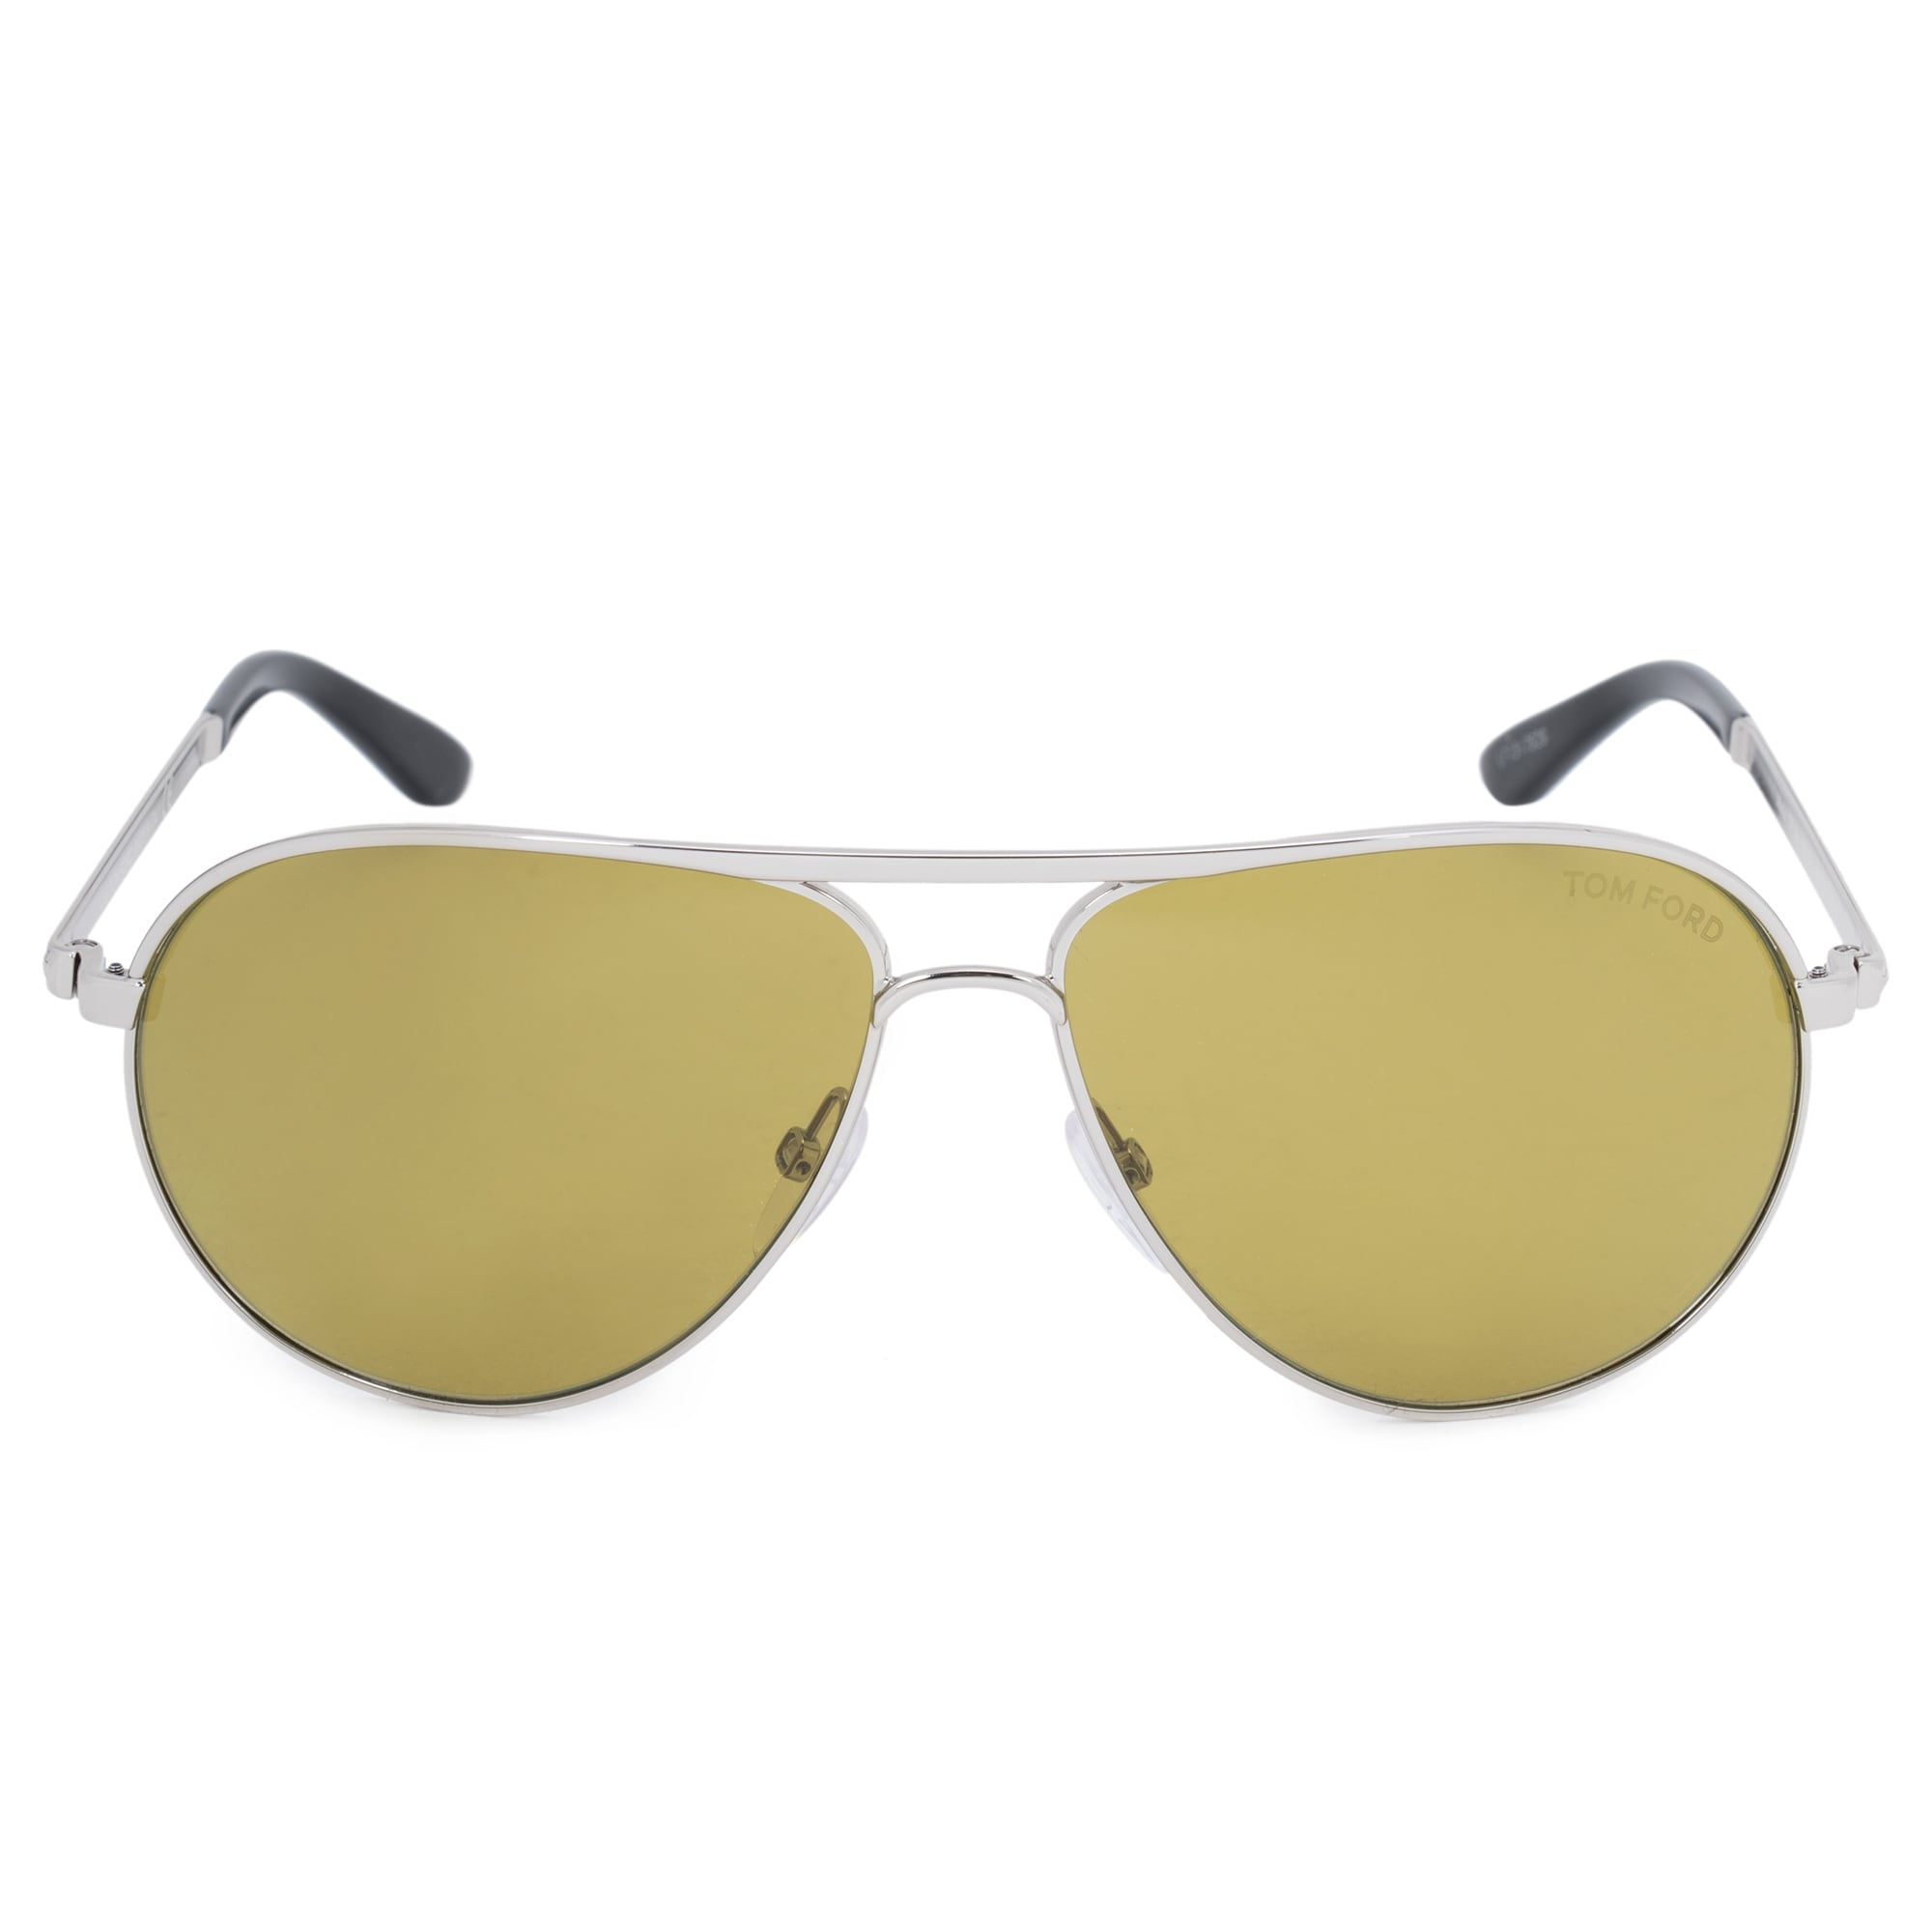 f0d15773274 Shop Tom Ford Marko Aviator Sunglasses FT0144 18N 58 - On Sale ...